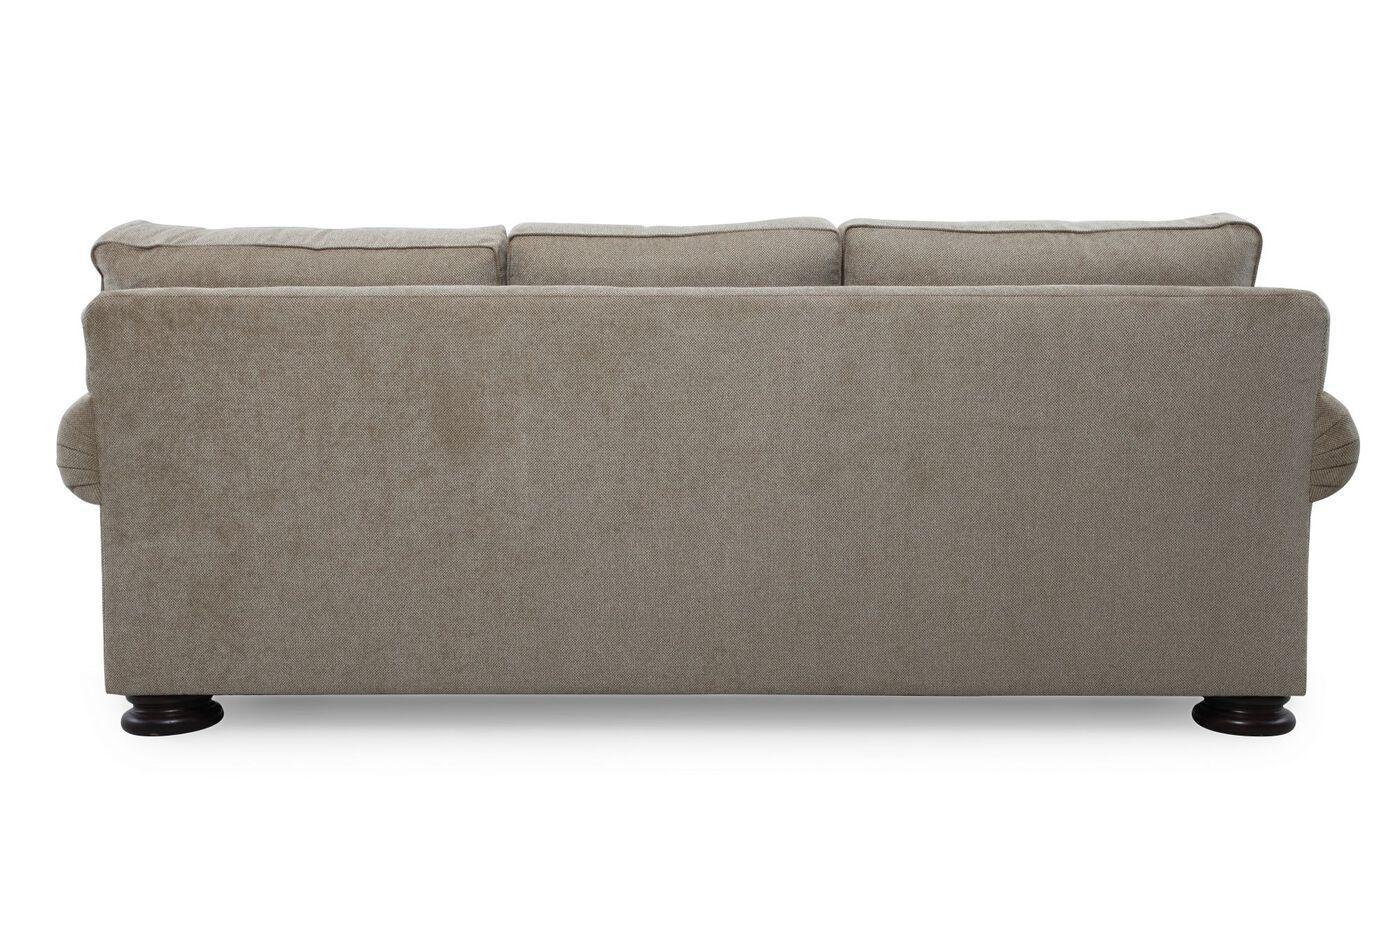 Bernhardt Foster Brown Sofa | Mathis Brothers Furniture